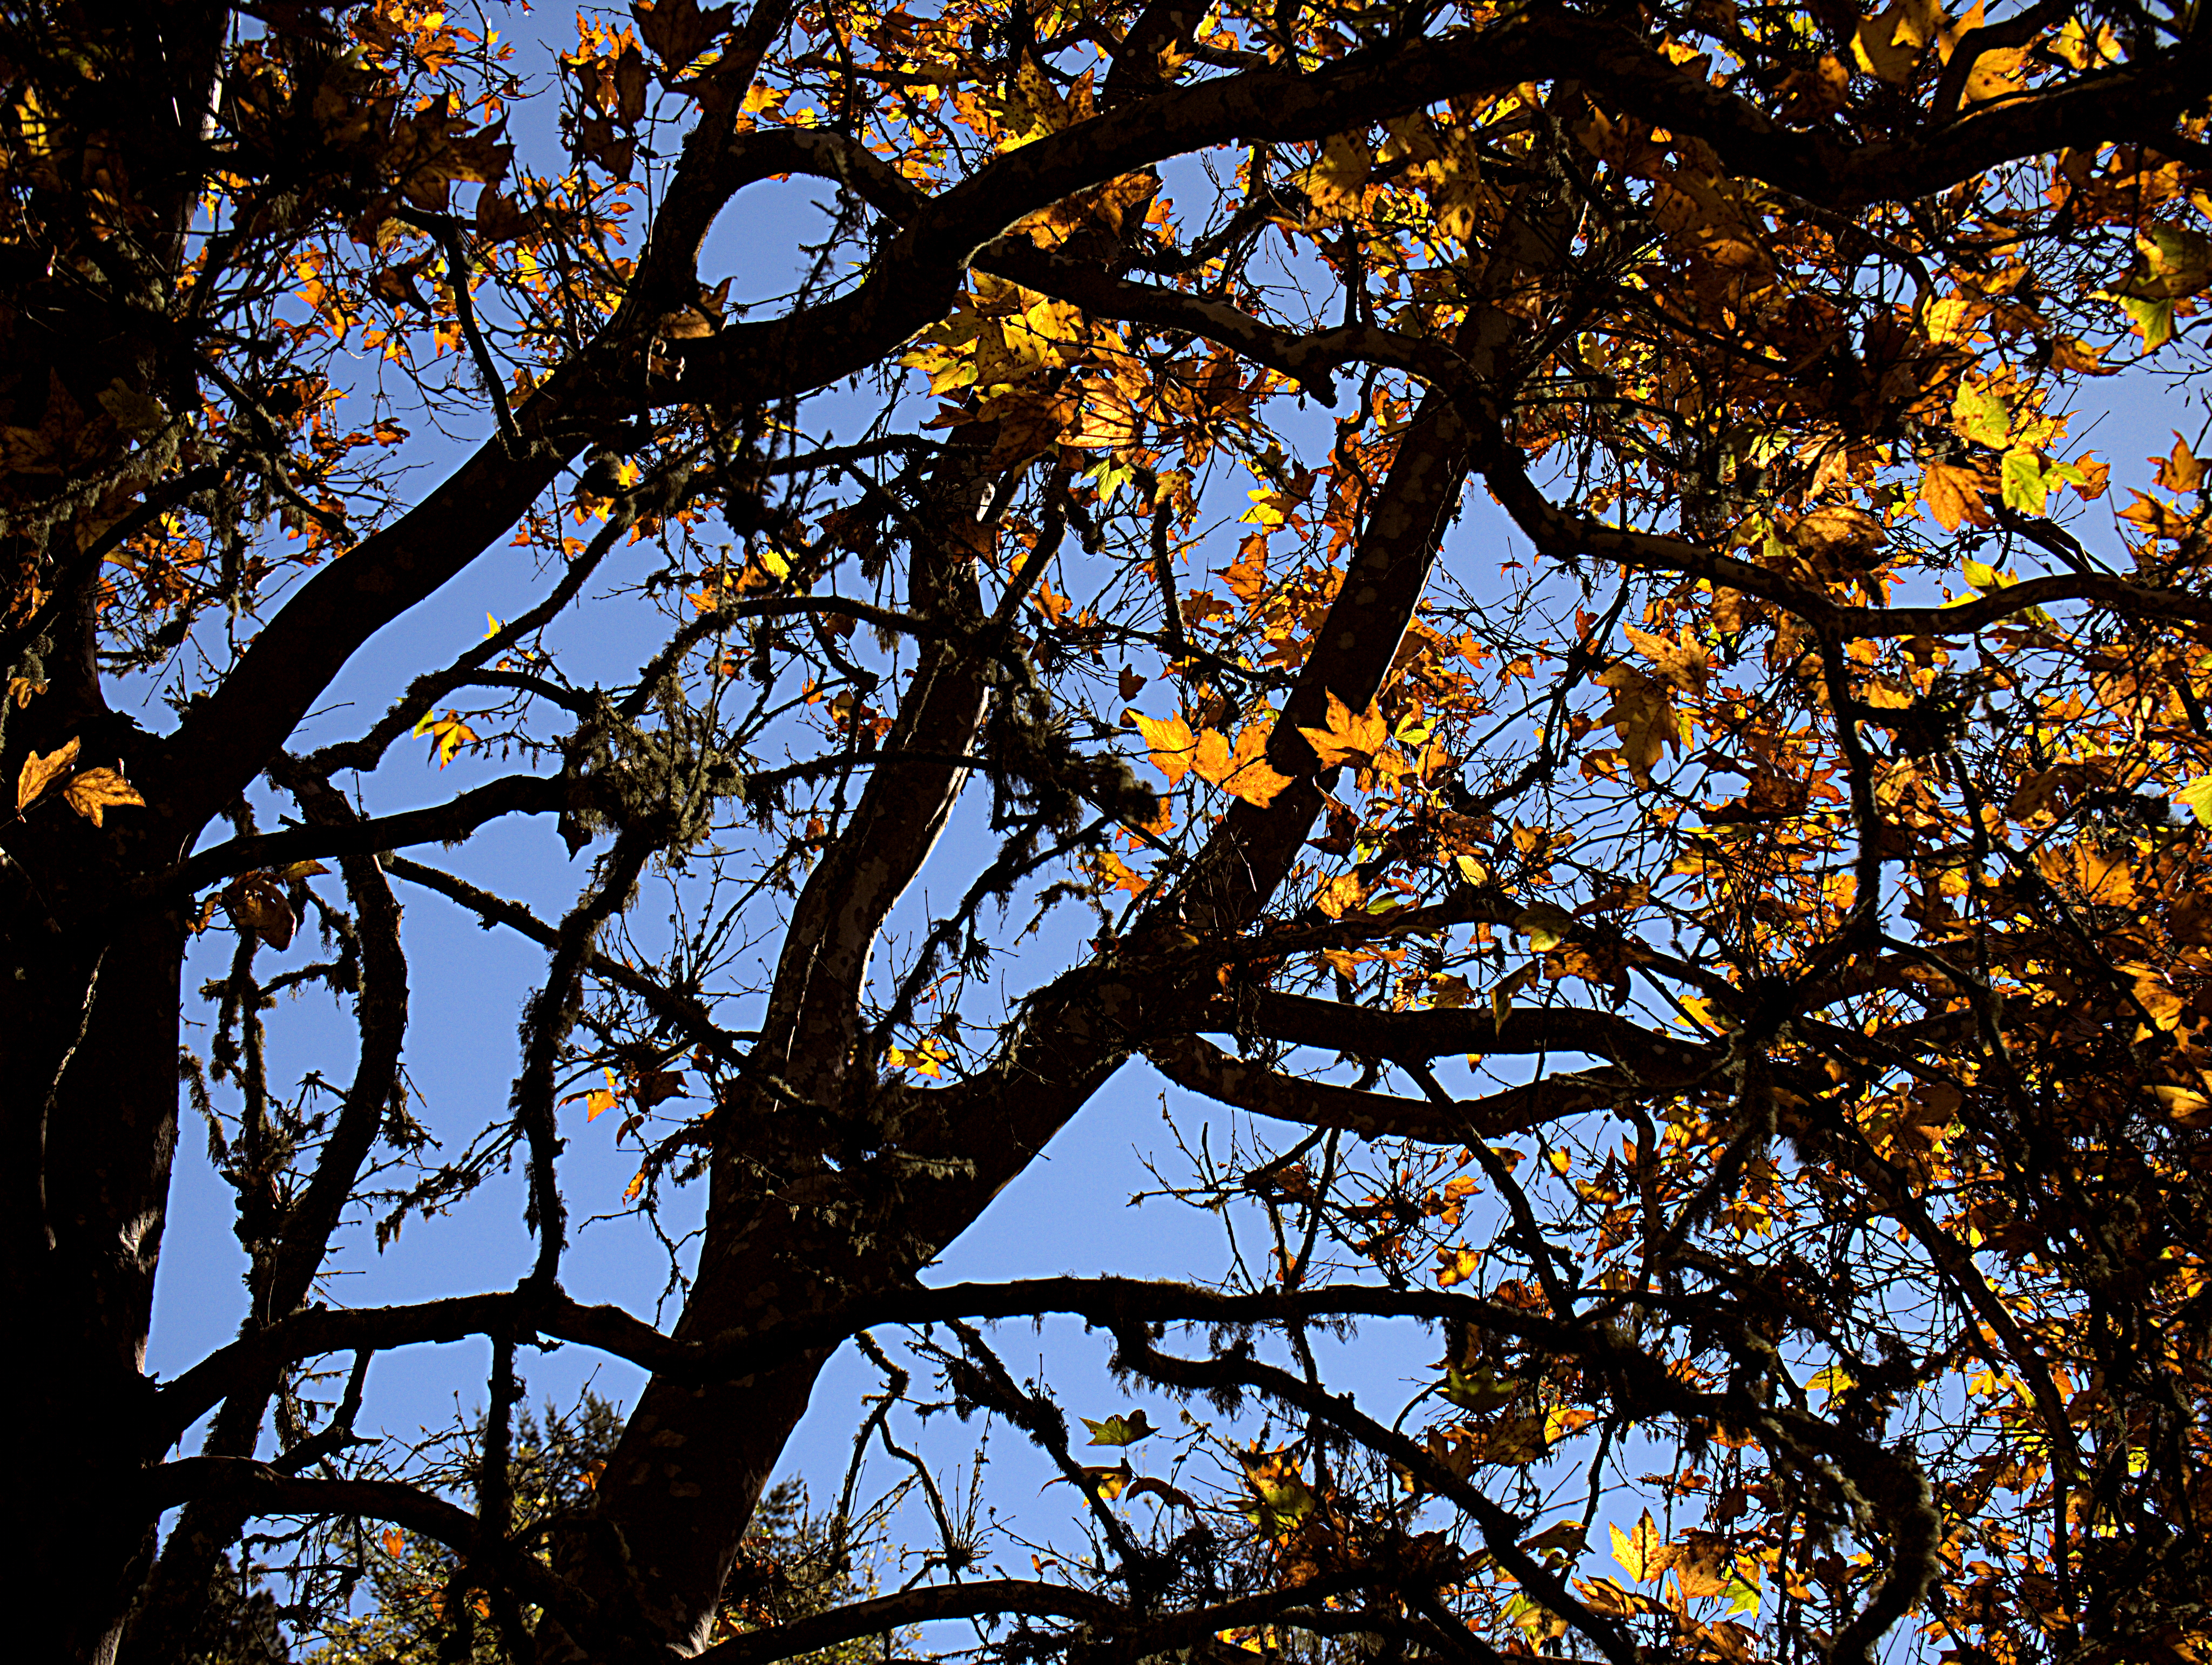 Image of California sycamore